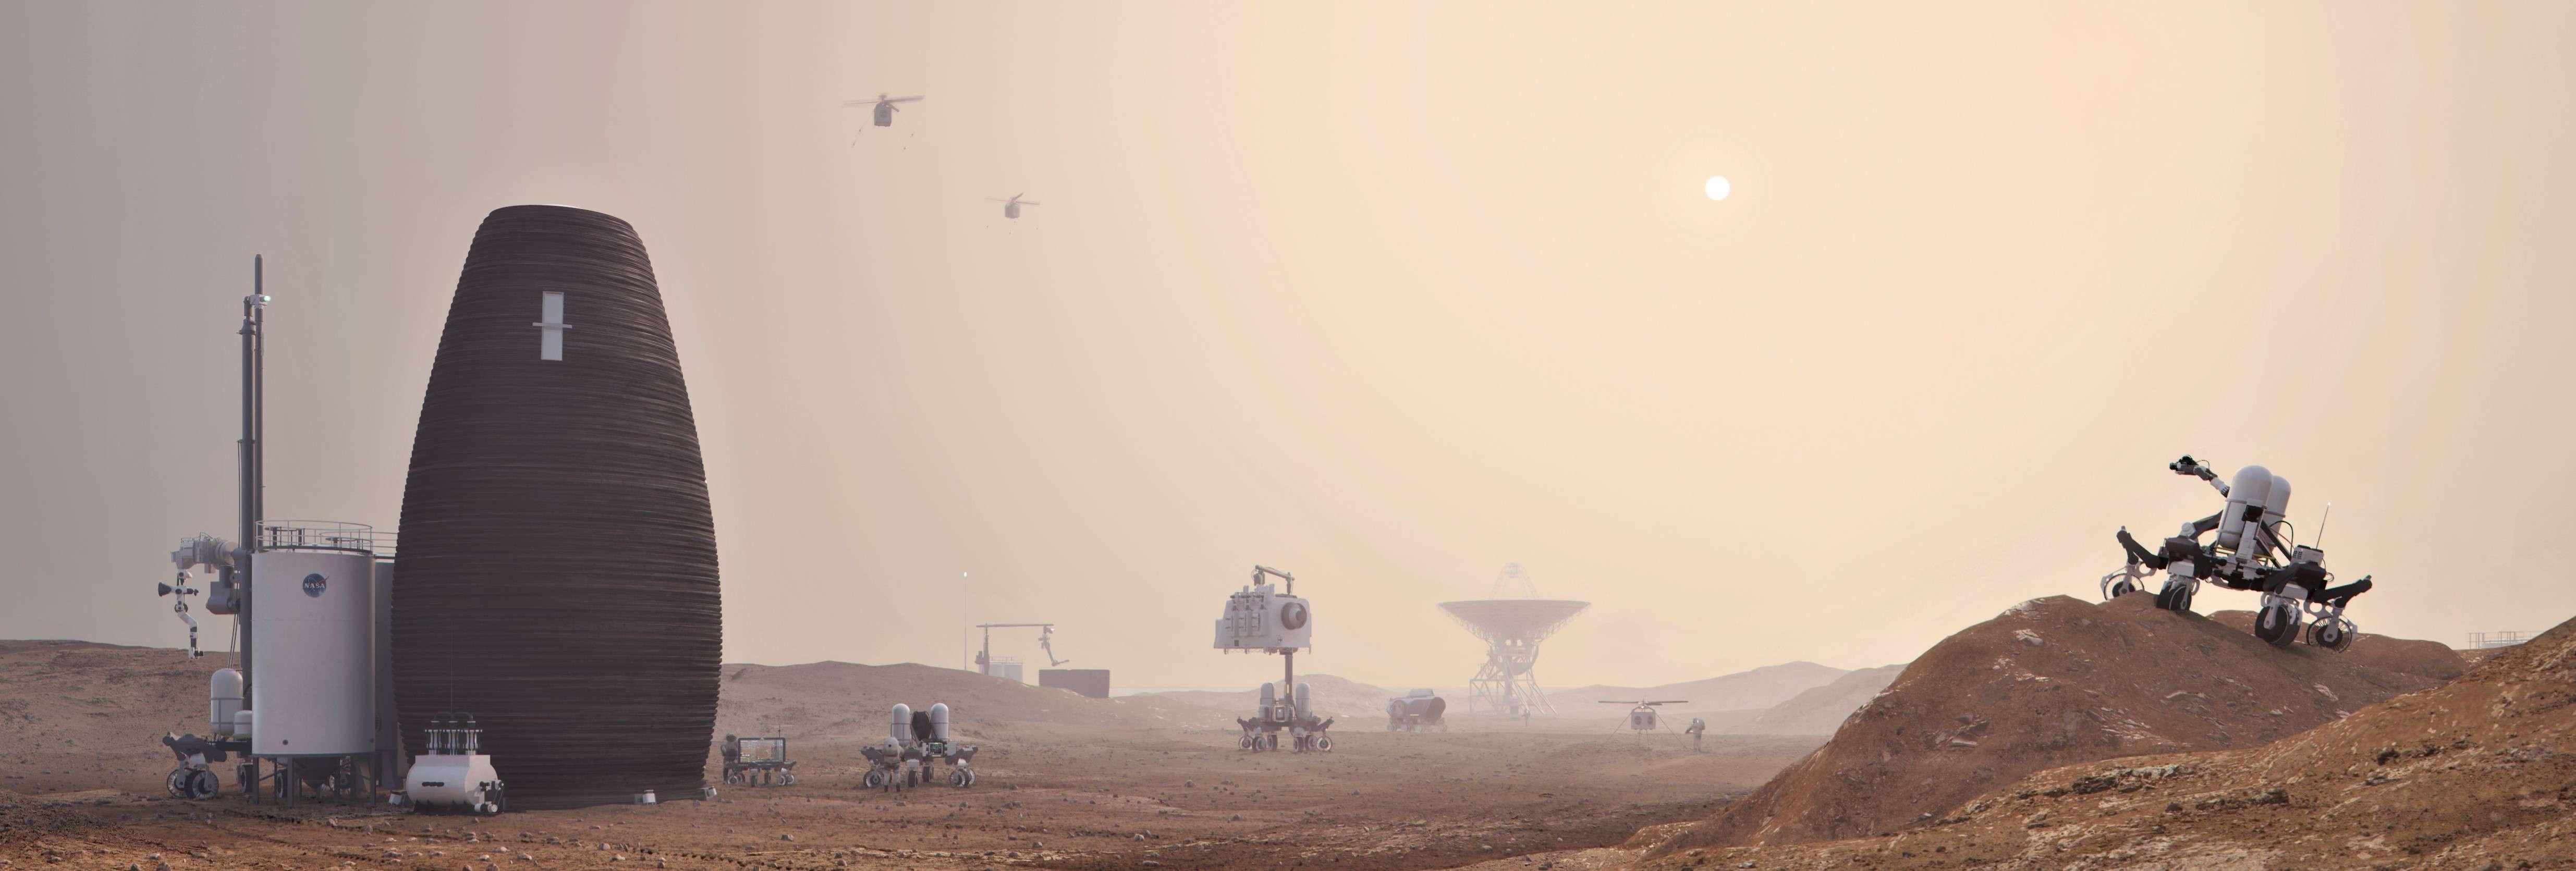 MARSHA Mars habitat colony (AI Space Factory) 5 crop (c)